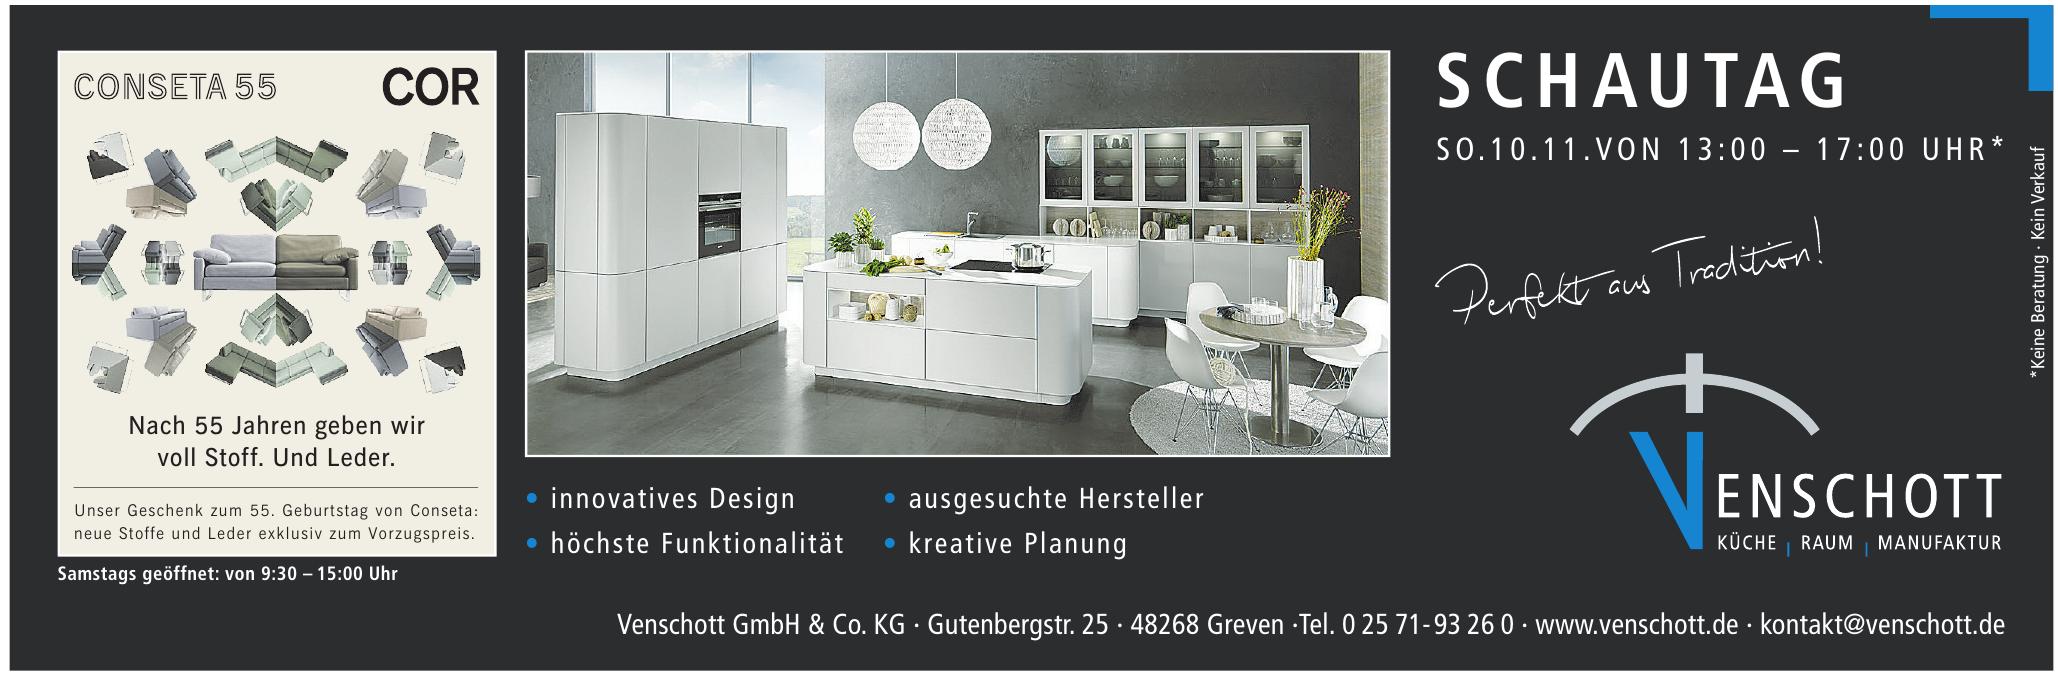 Venschott GmbH & Co. KG